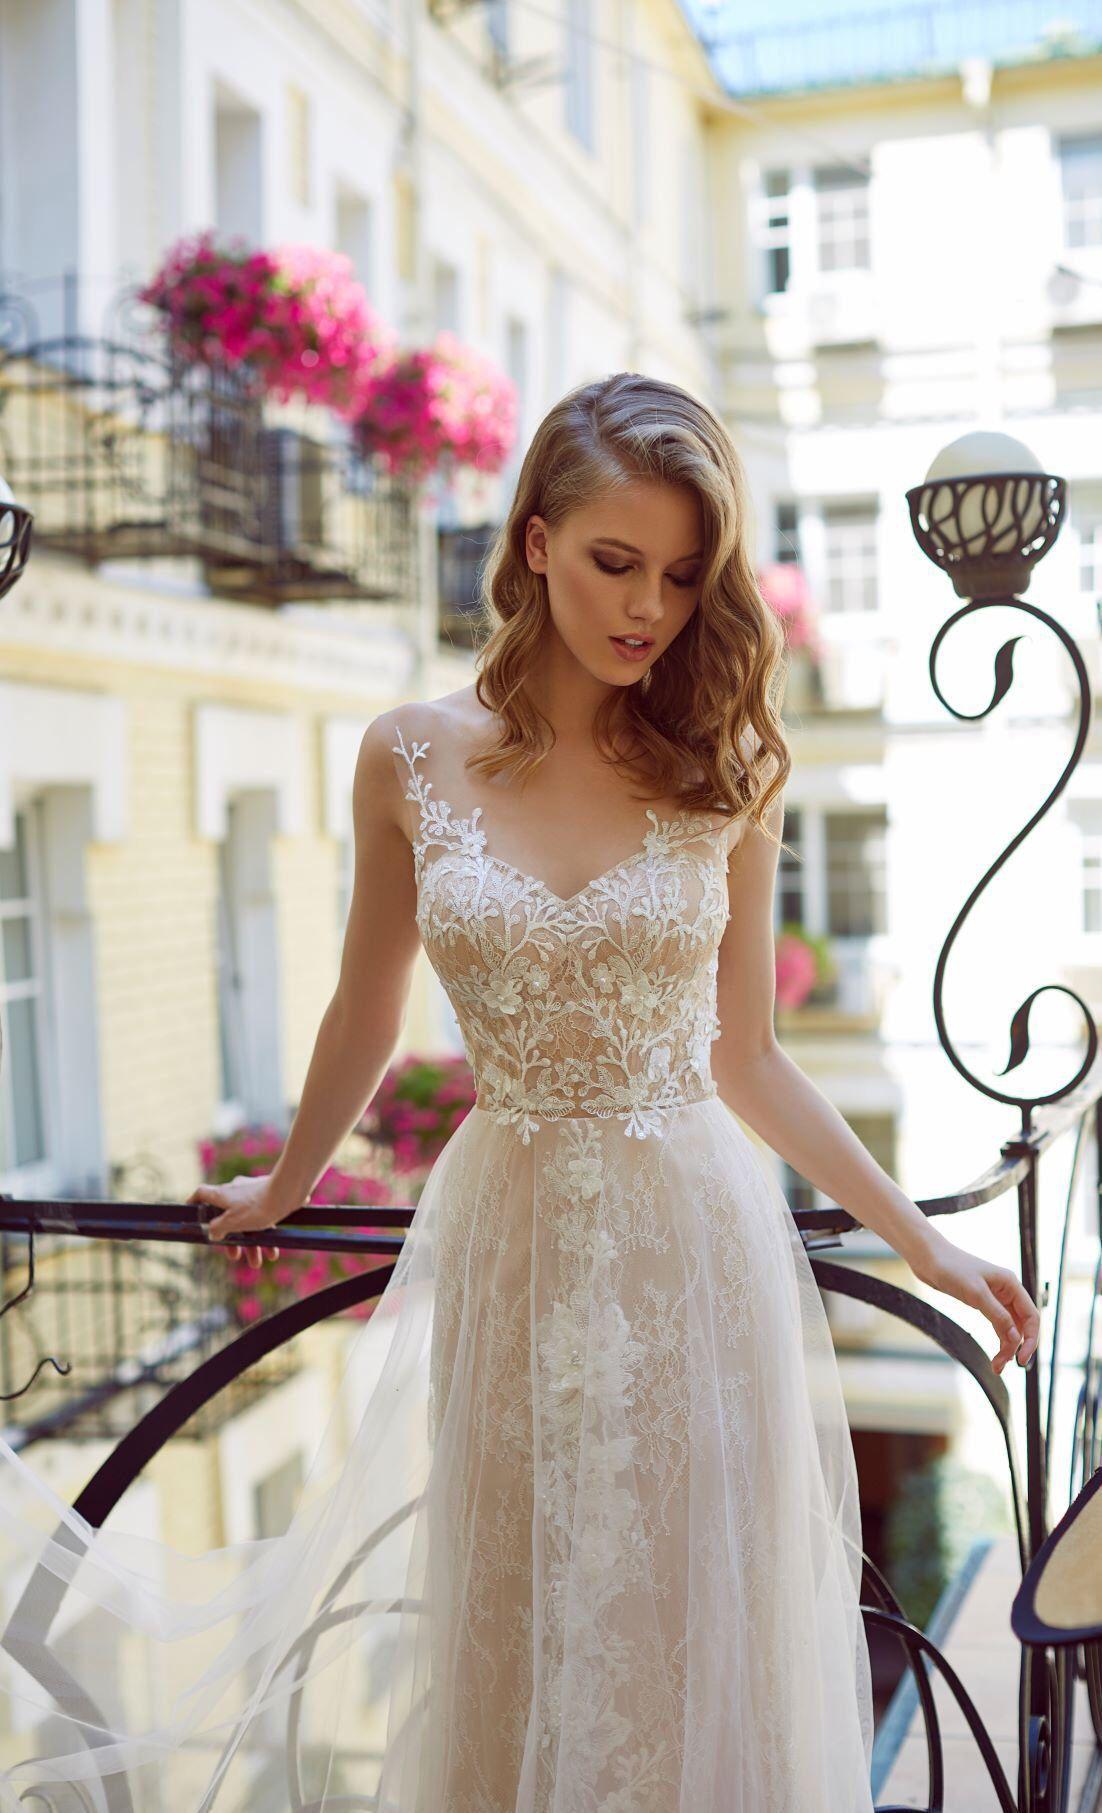 Delicate Lace Wedding Dress Floral Bridal Gown Romantic Bohemian